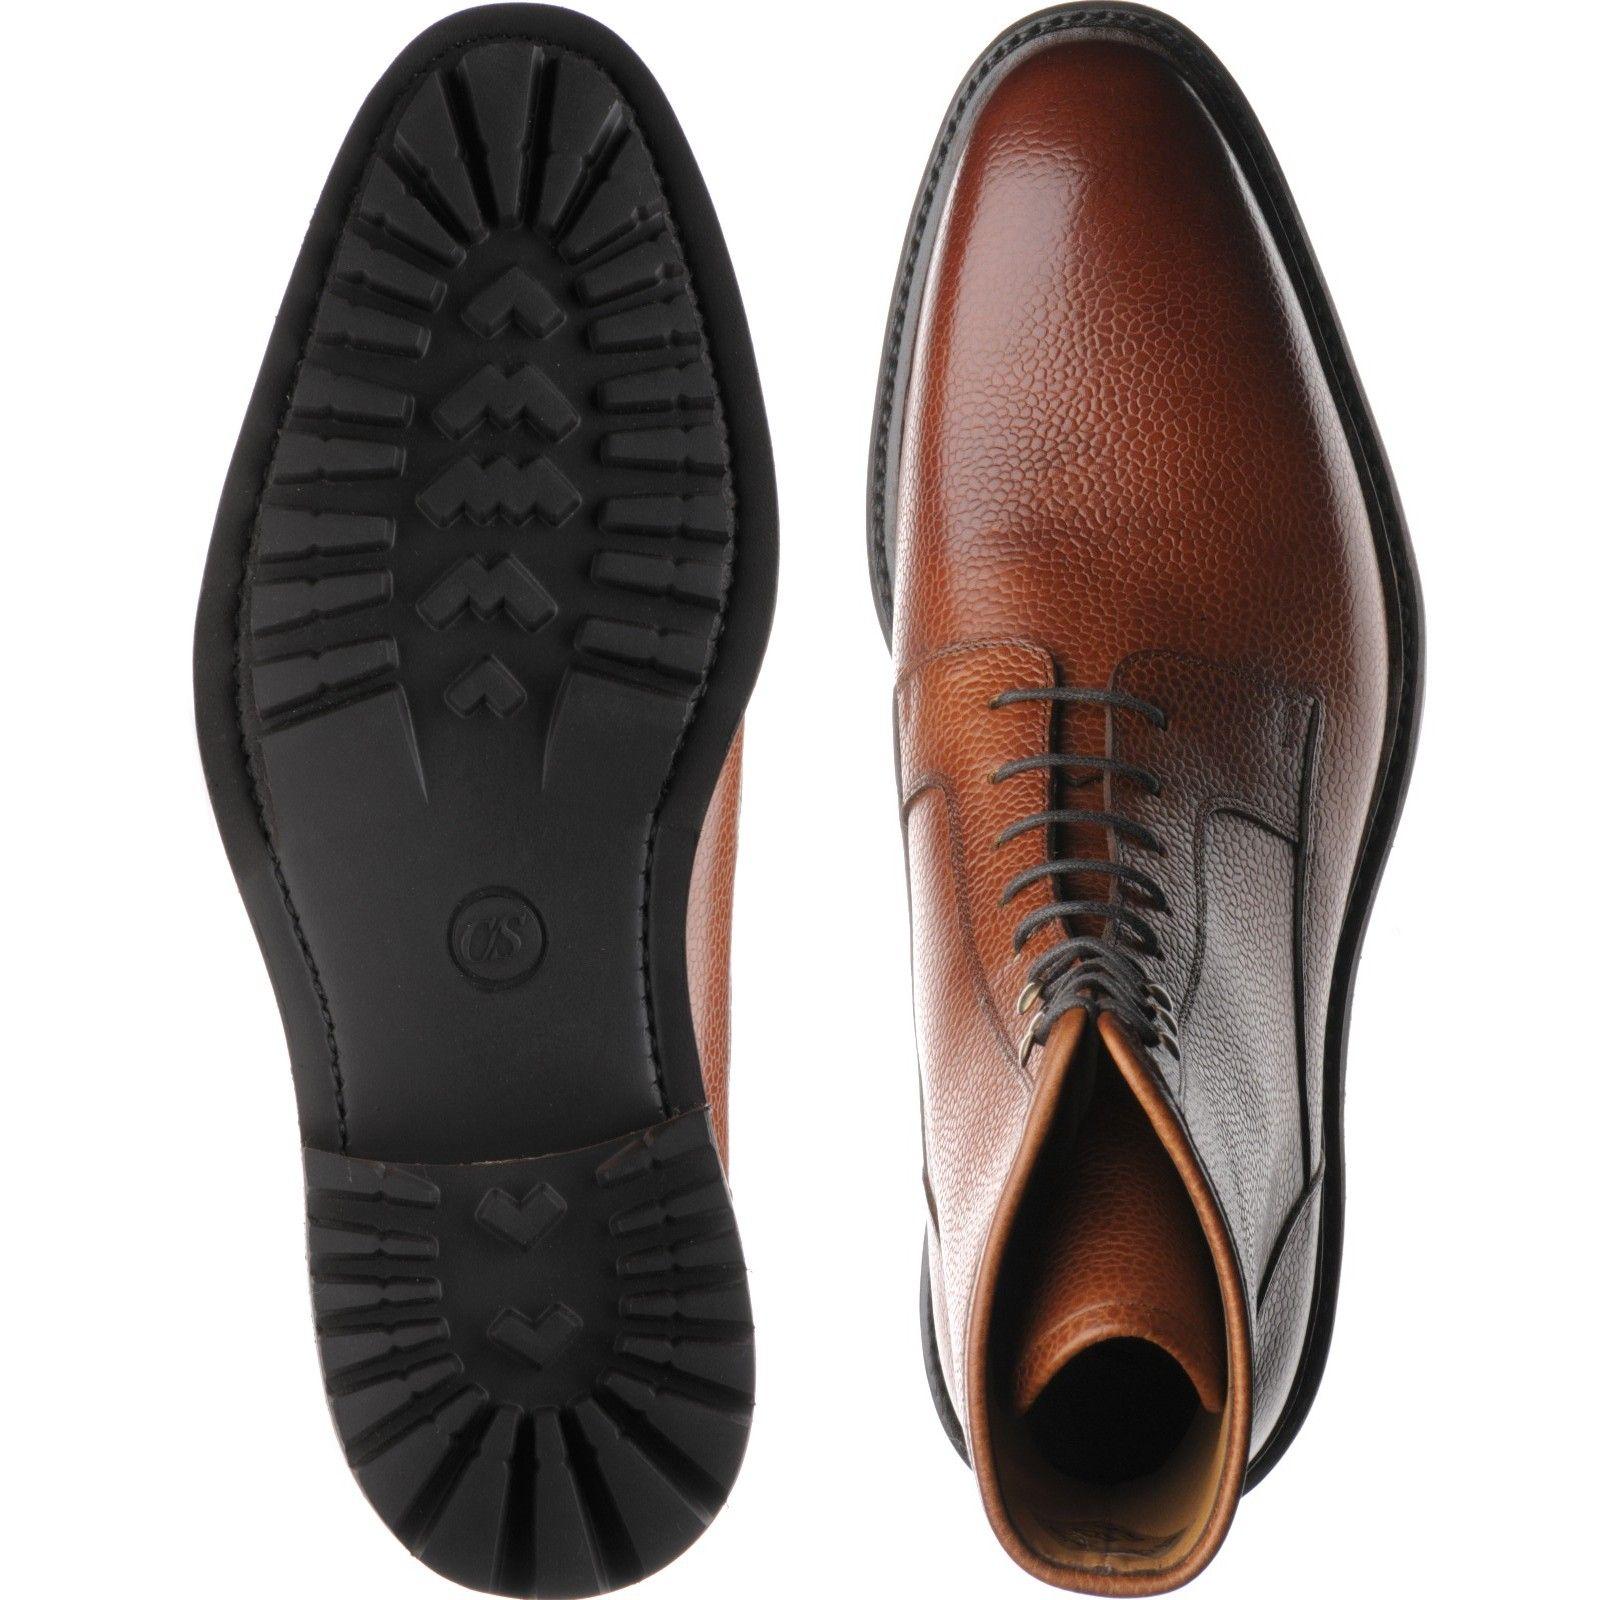 19a8de419bbd1 Herring shoes | Herring Classic | Churchstow Norwegian boot in Tan Grain at  Herring Shoes